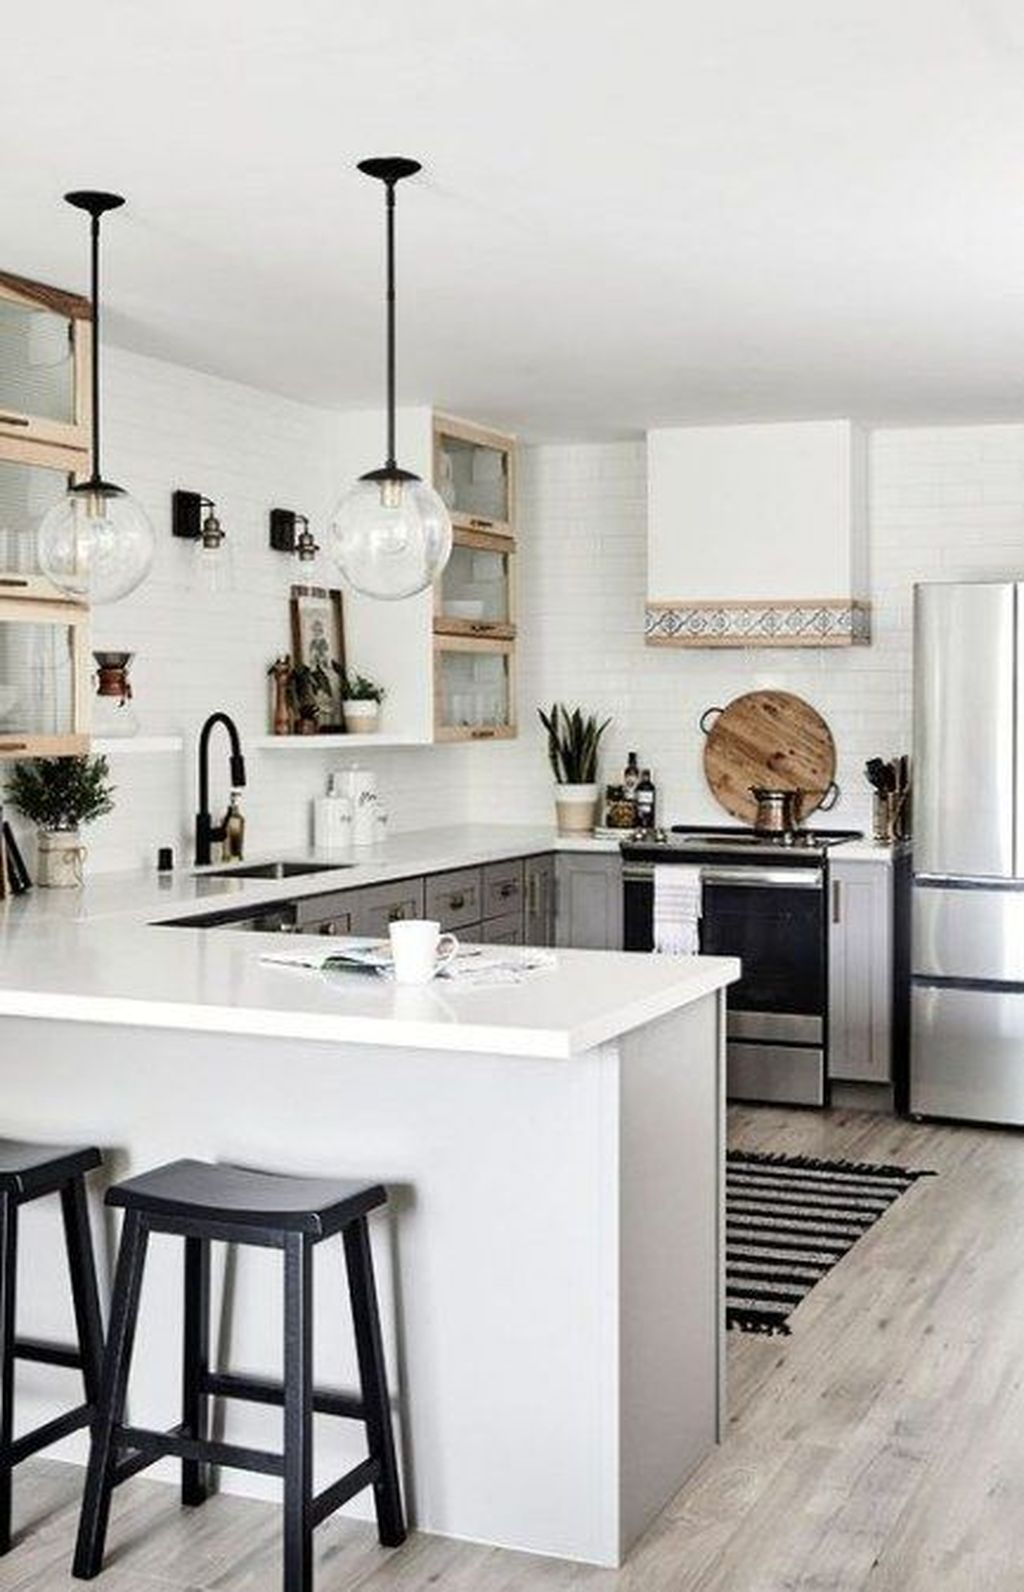 Popular Apartment Kitchen Design Ideas You Should Copy 28